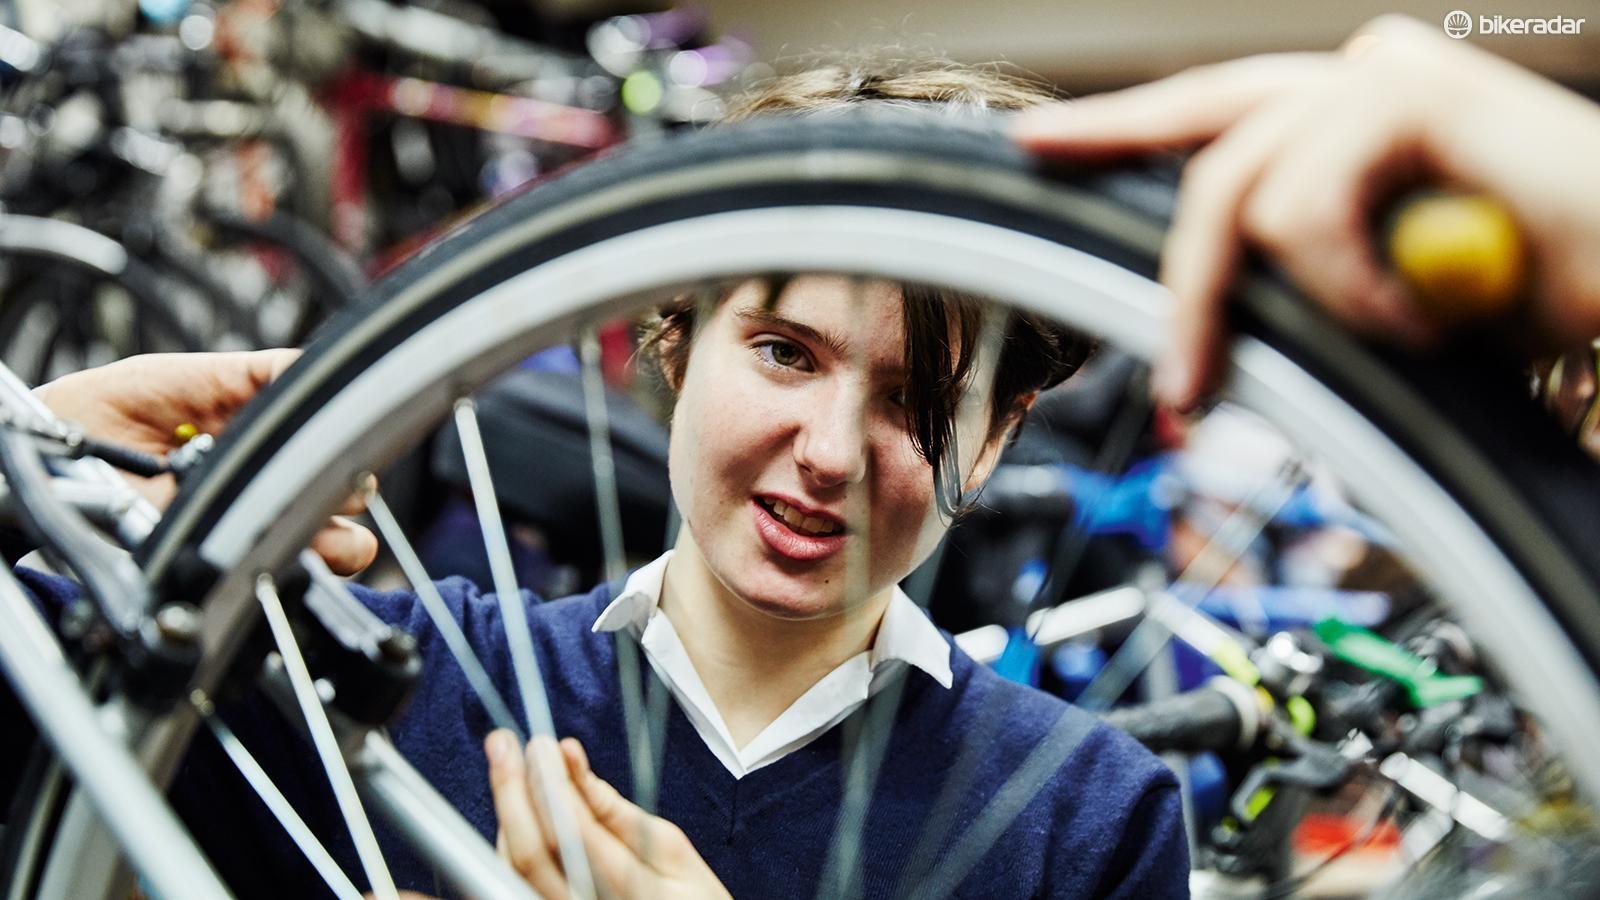 Volunteers work to repair the bikes, learning valuable skills themselves